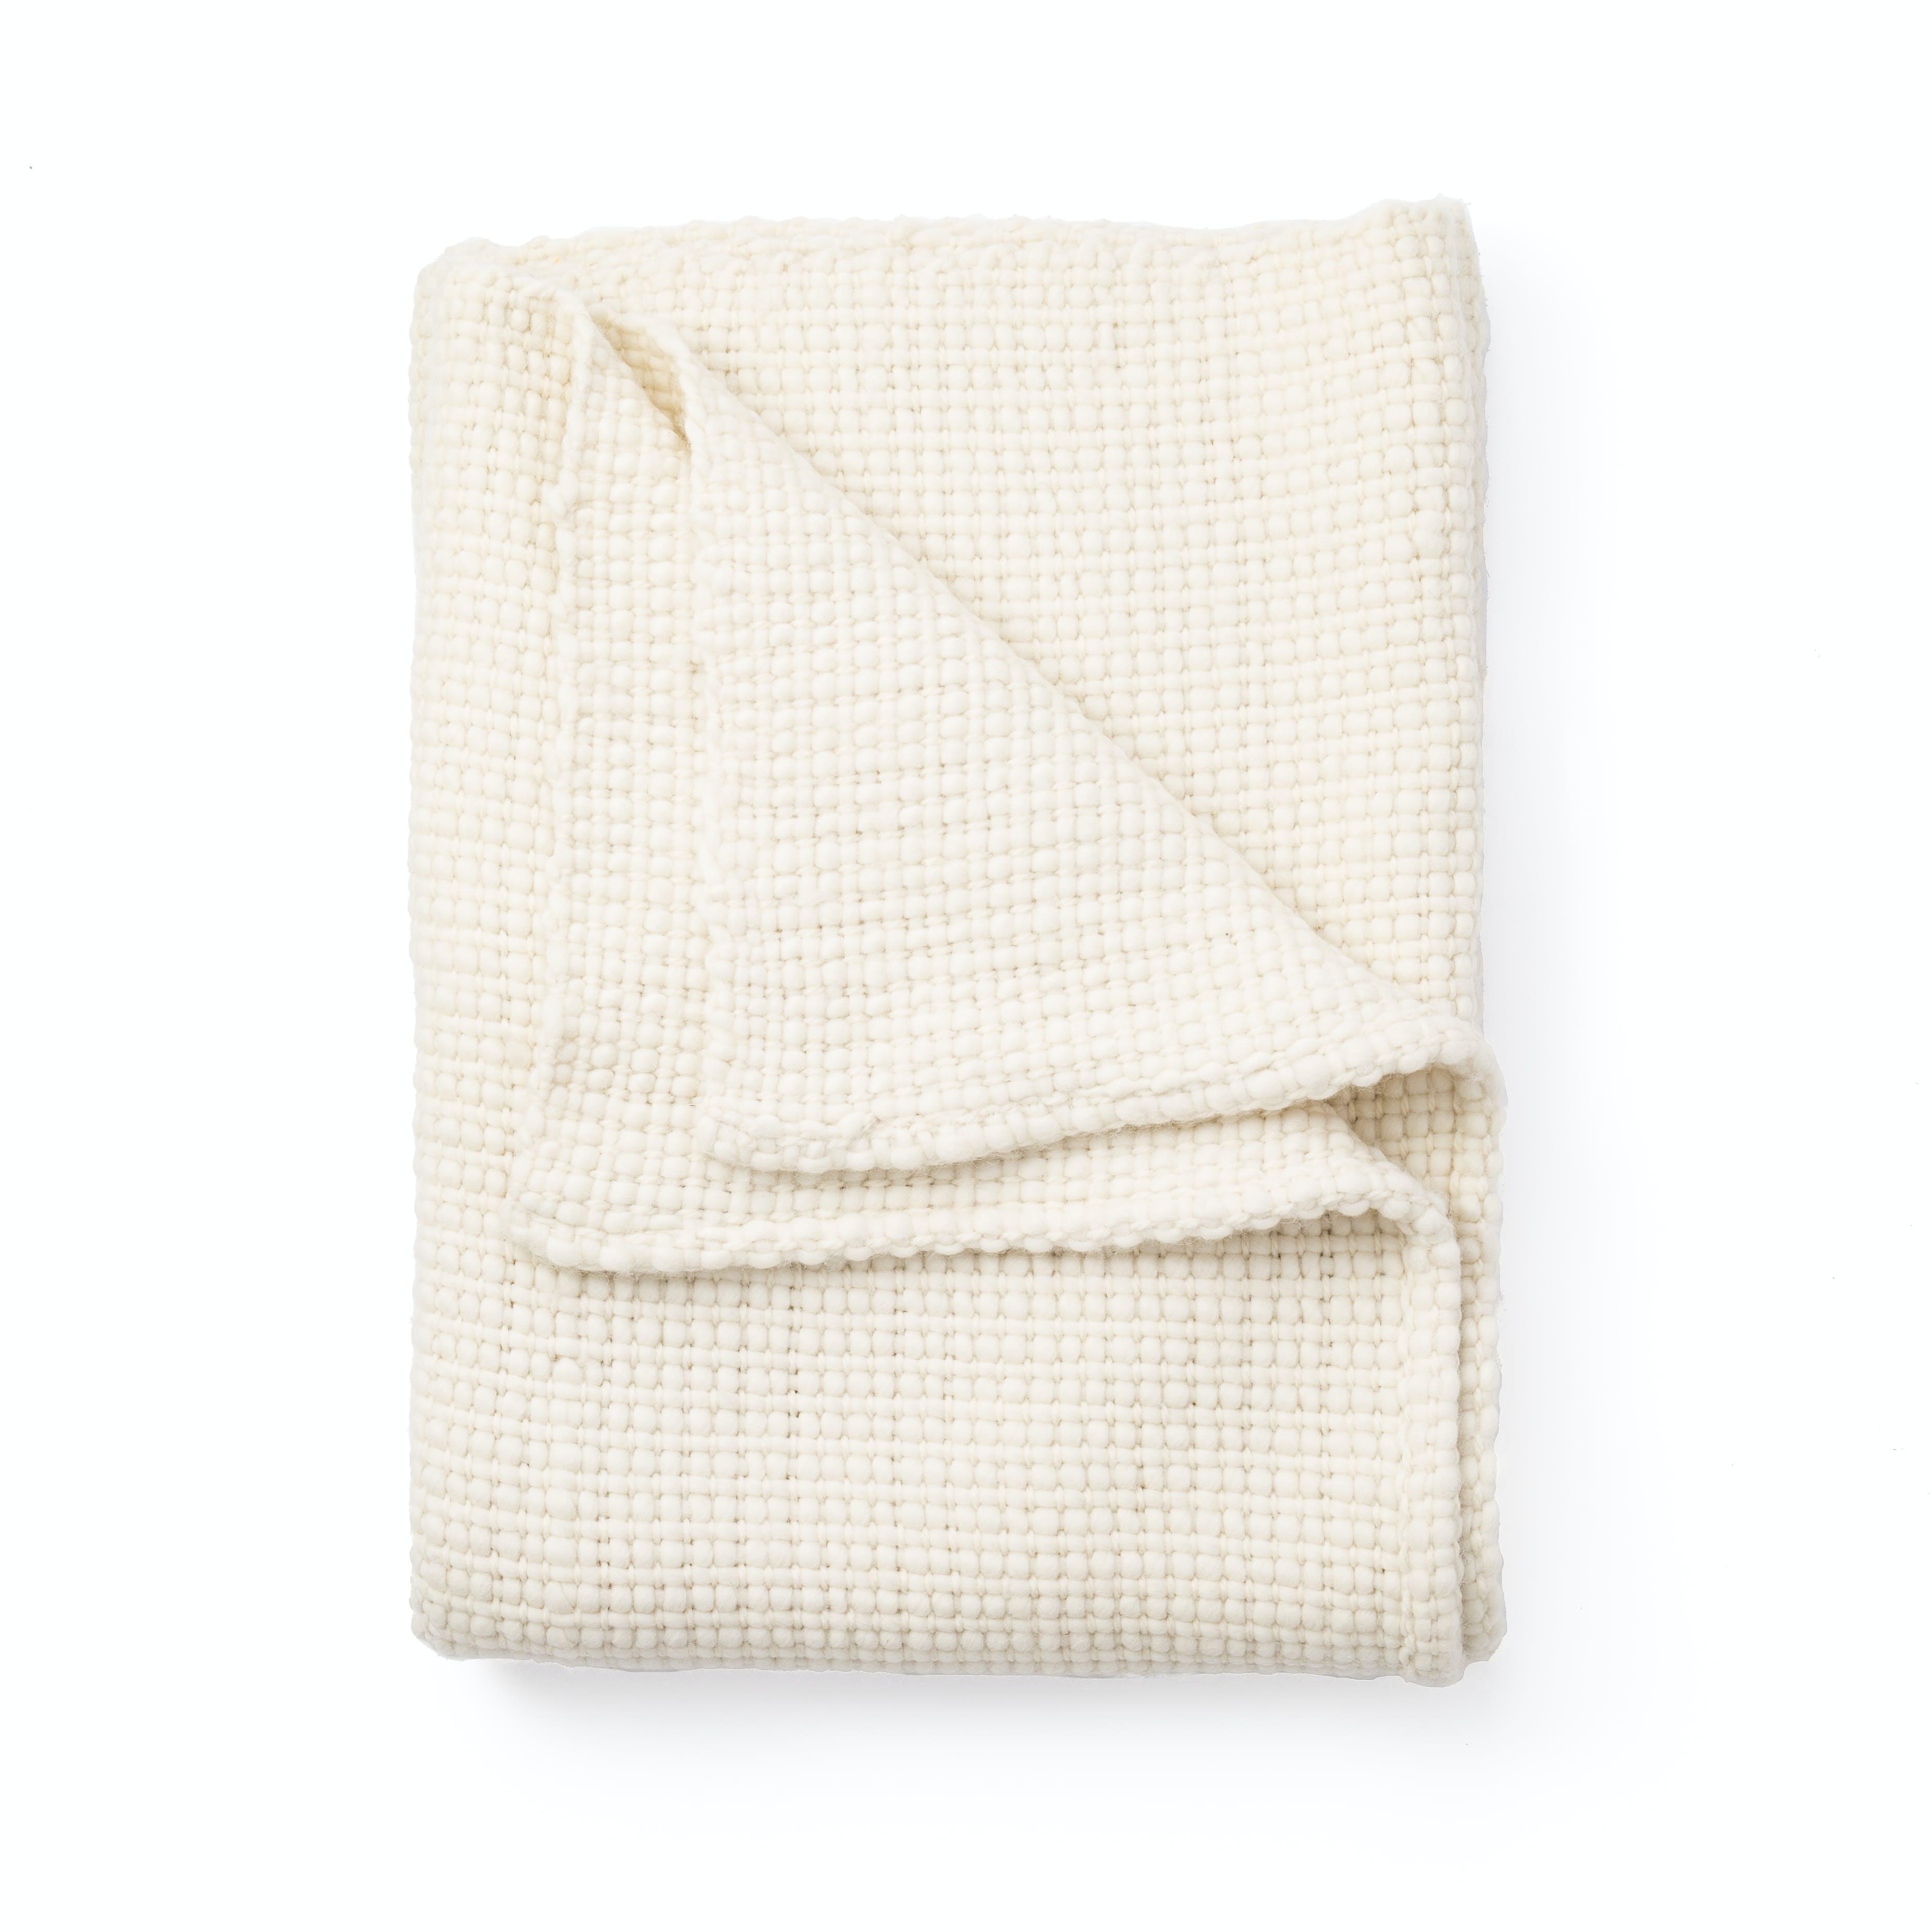 Jbezh0f6rc the citizenry peruvian wool abrazo blanket 0 original